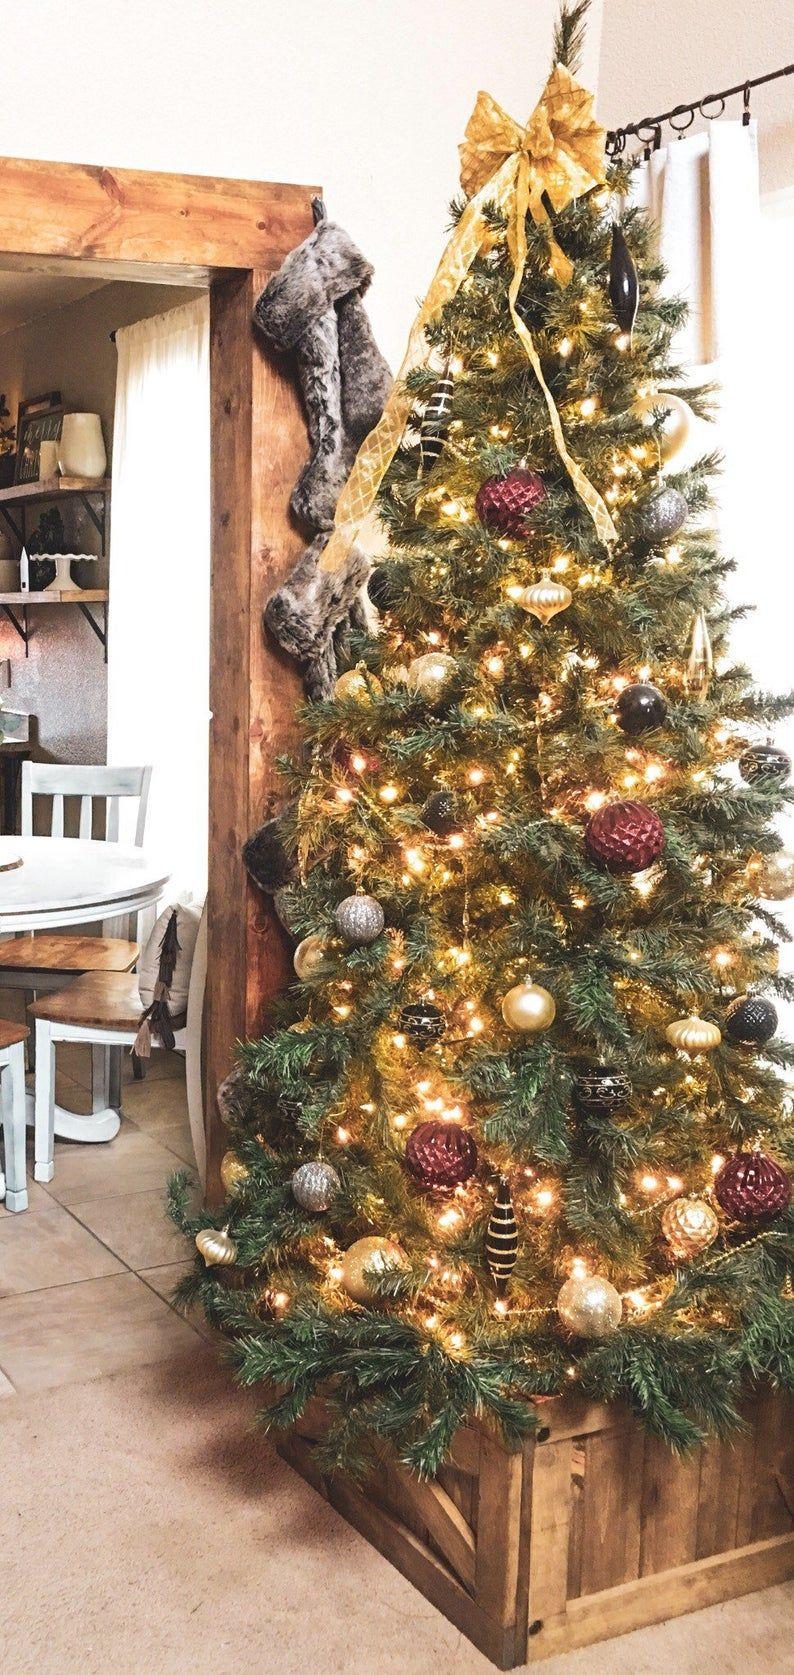 Christmas Tree Box Tree Skirt Alternative Wood Tree Box Collapsible Tree Skirt In 2020 Christmas Tree Box Tree Box Christmas Tree